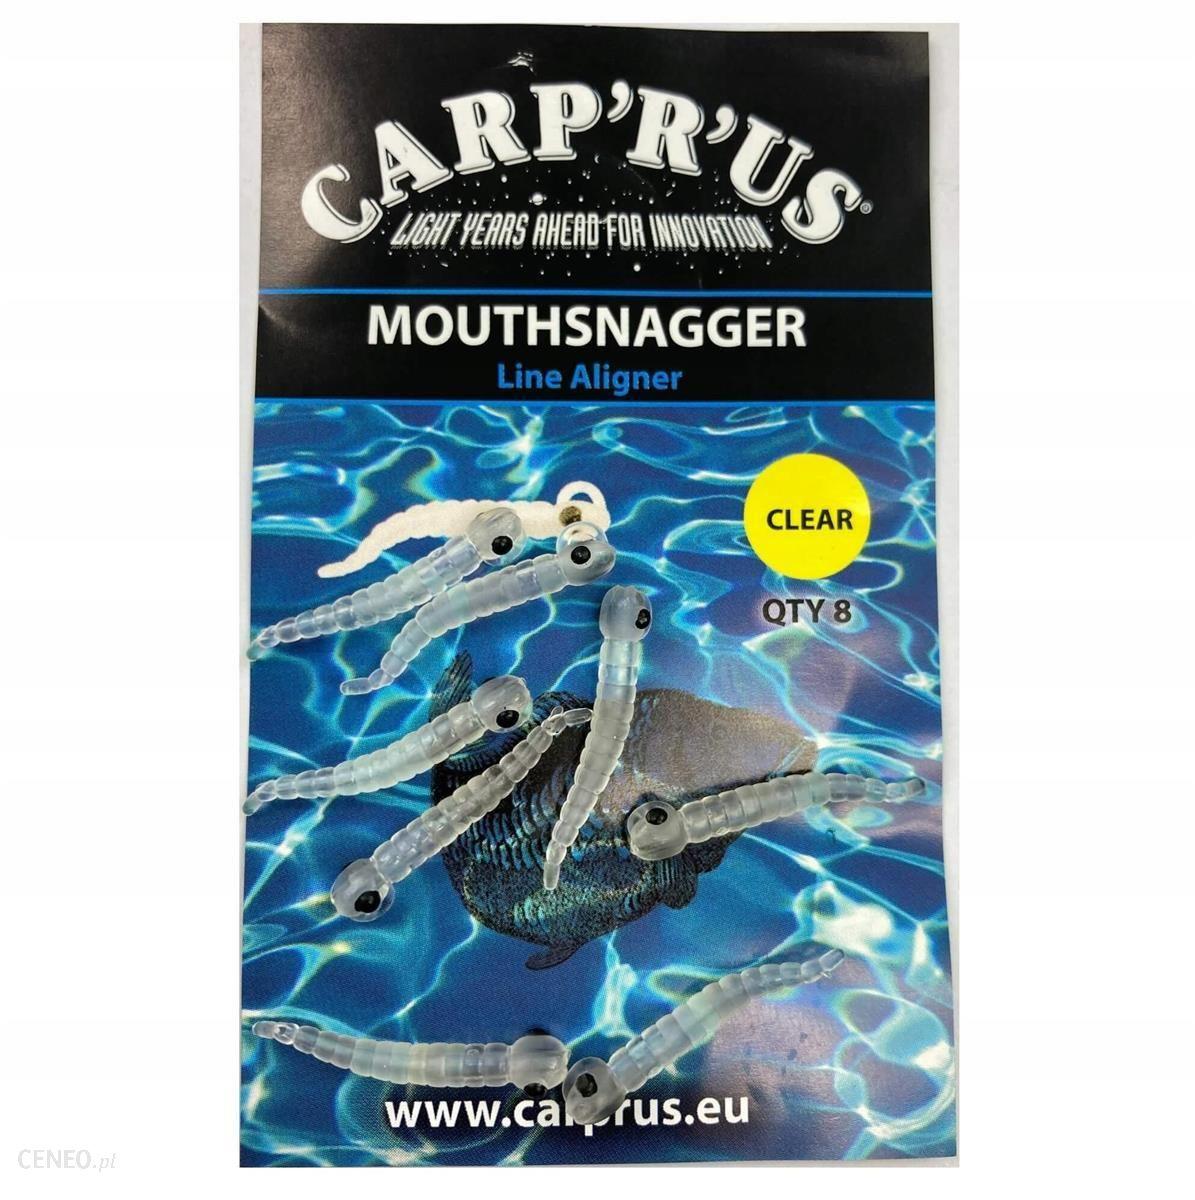 Carprus Carp'R'Us Mouthsnagger Przezroczyste